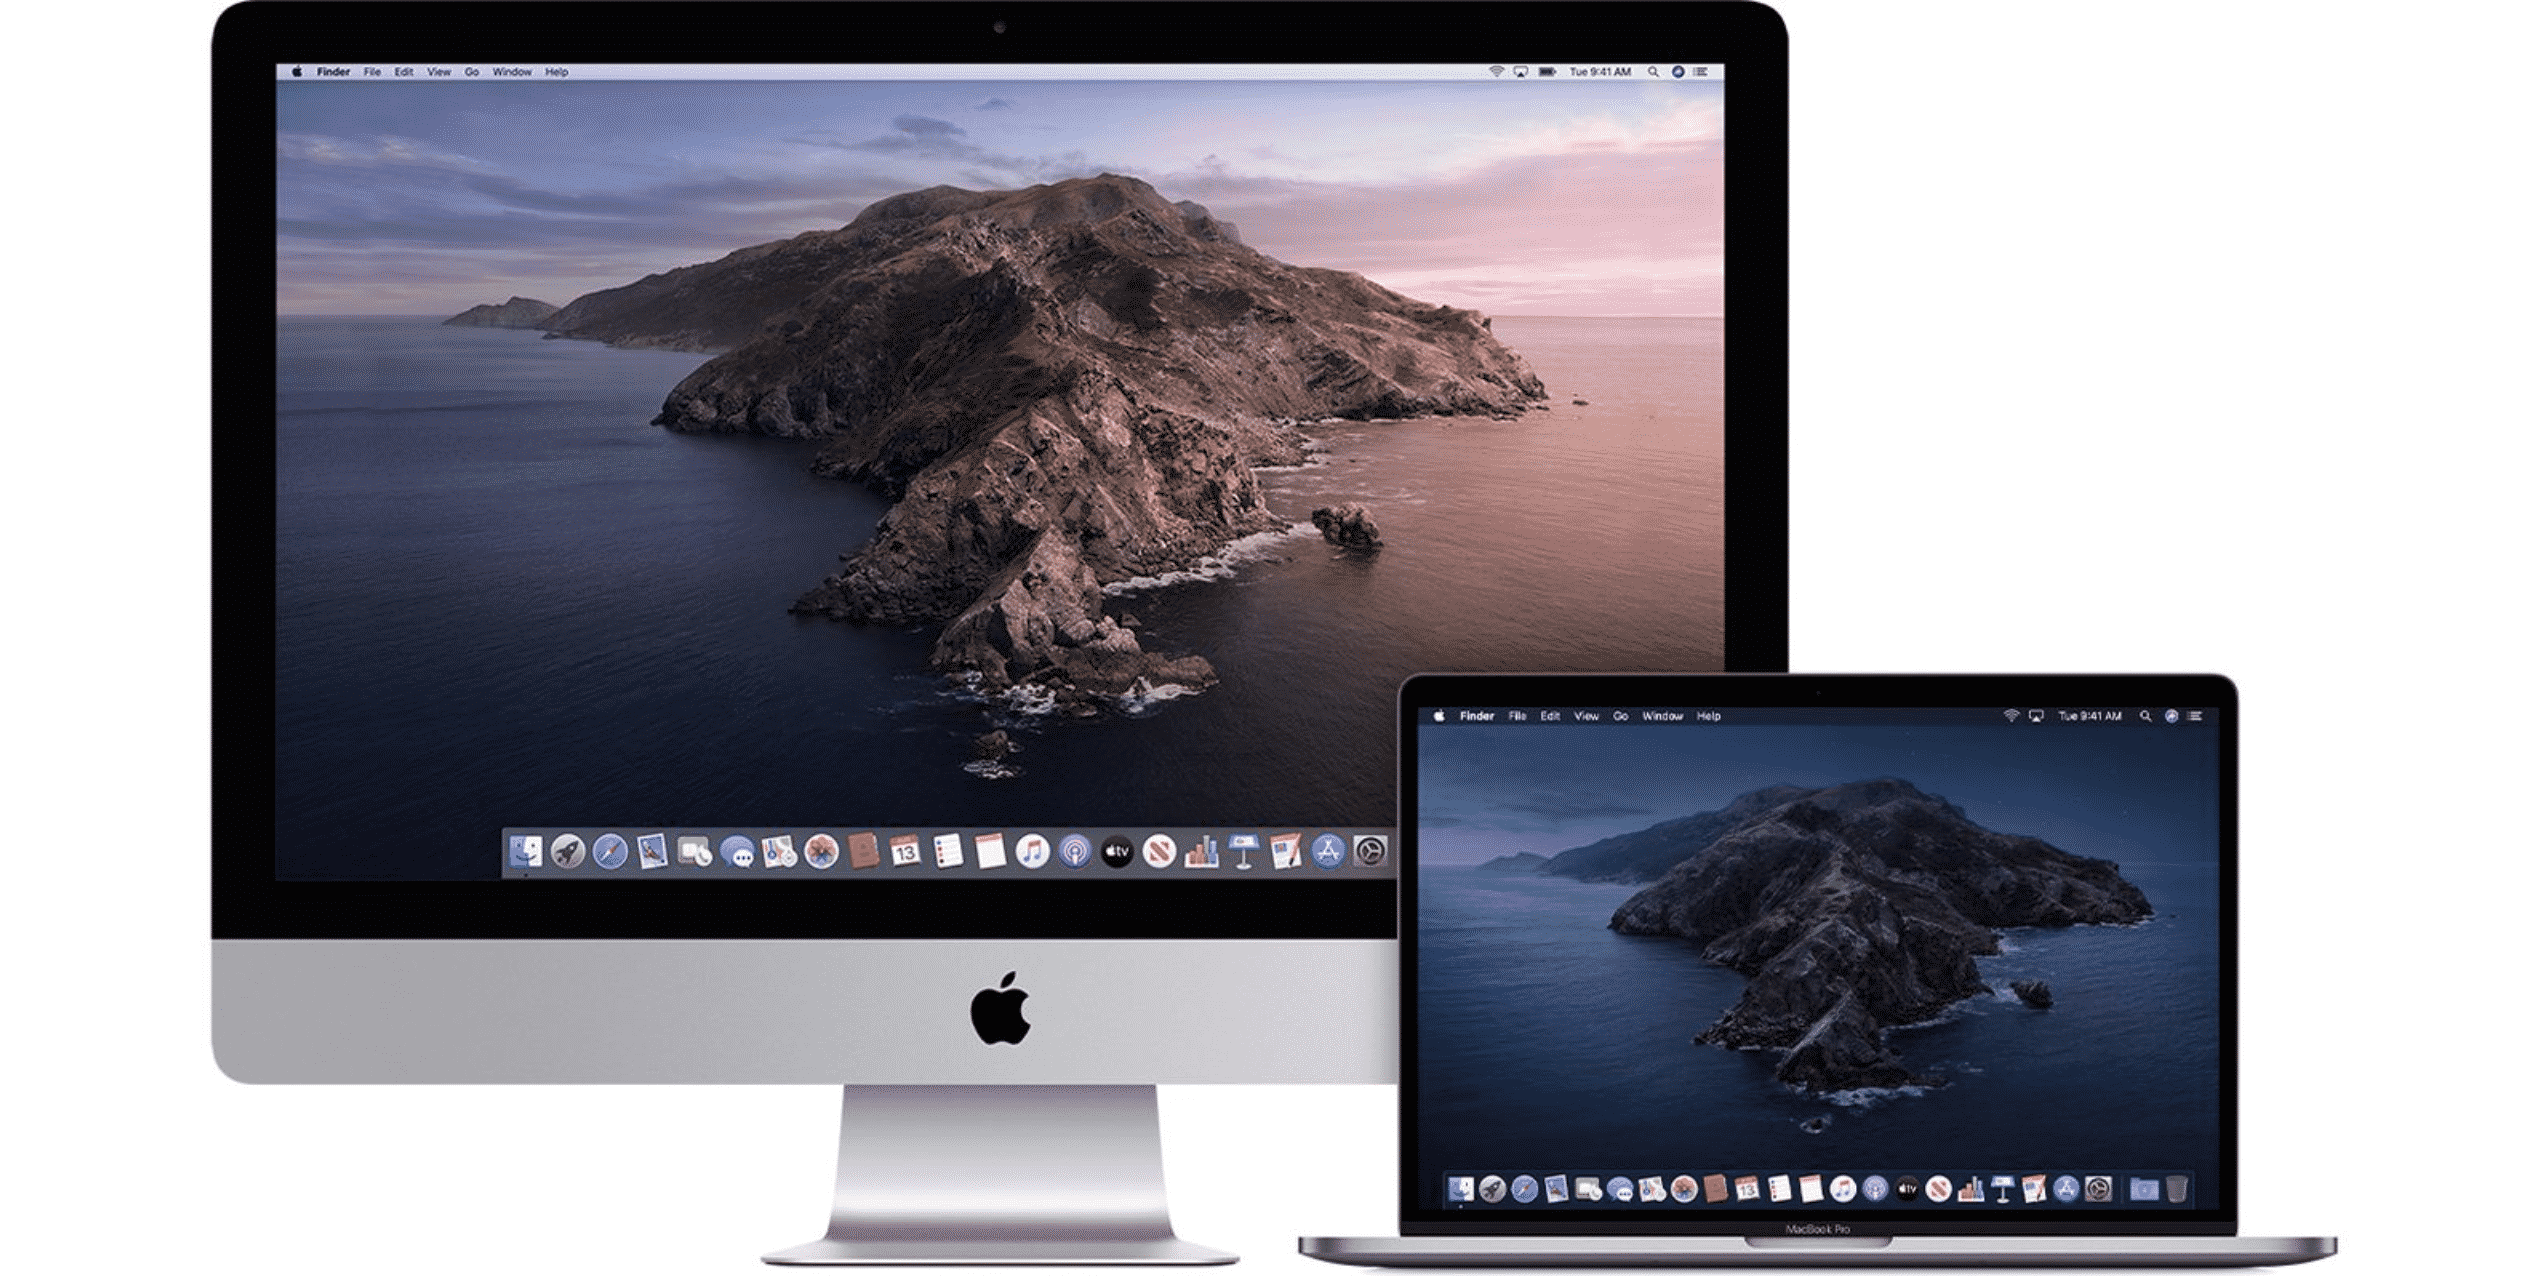 macOS 10.15.4